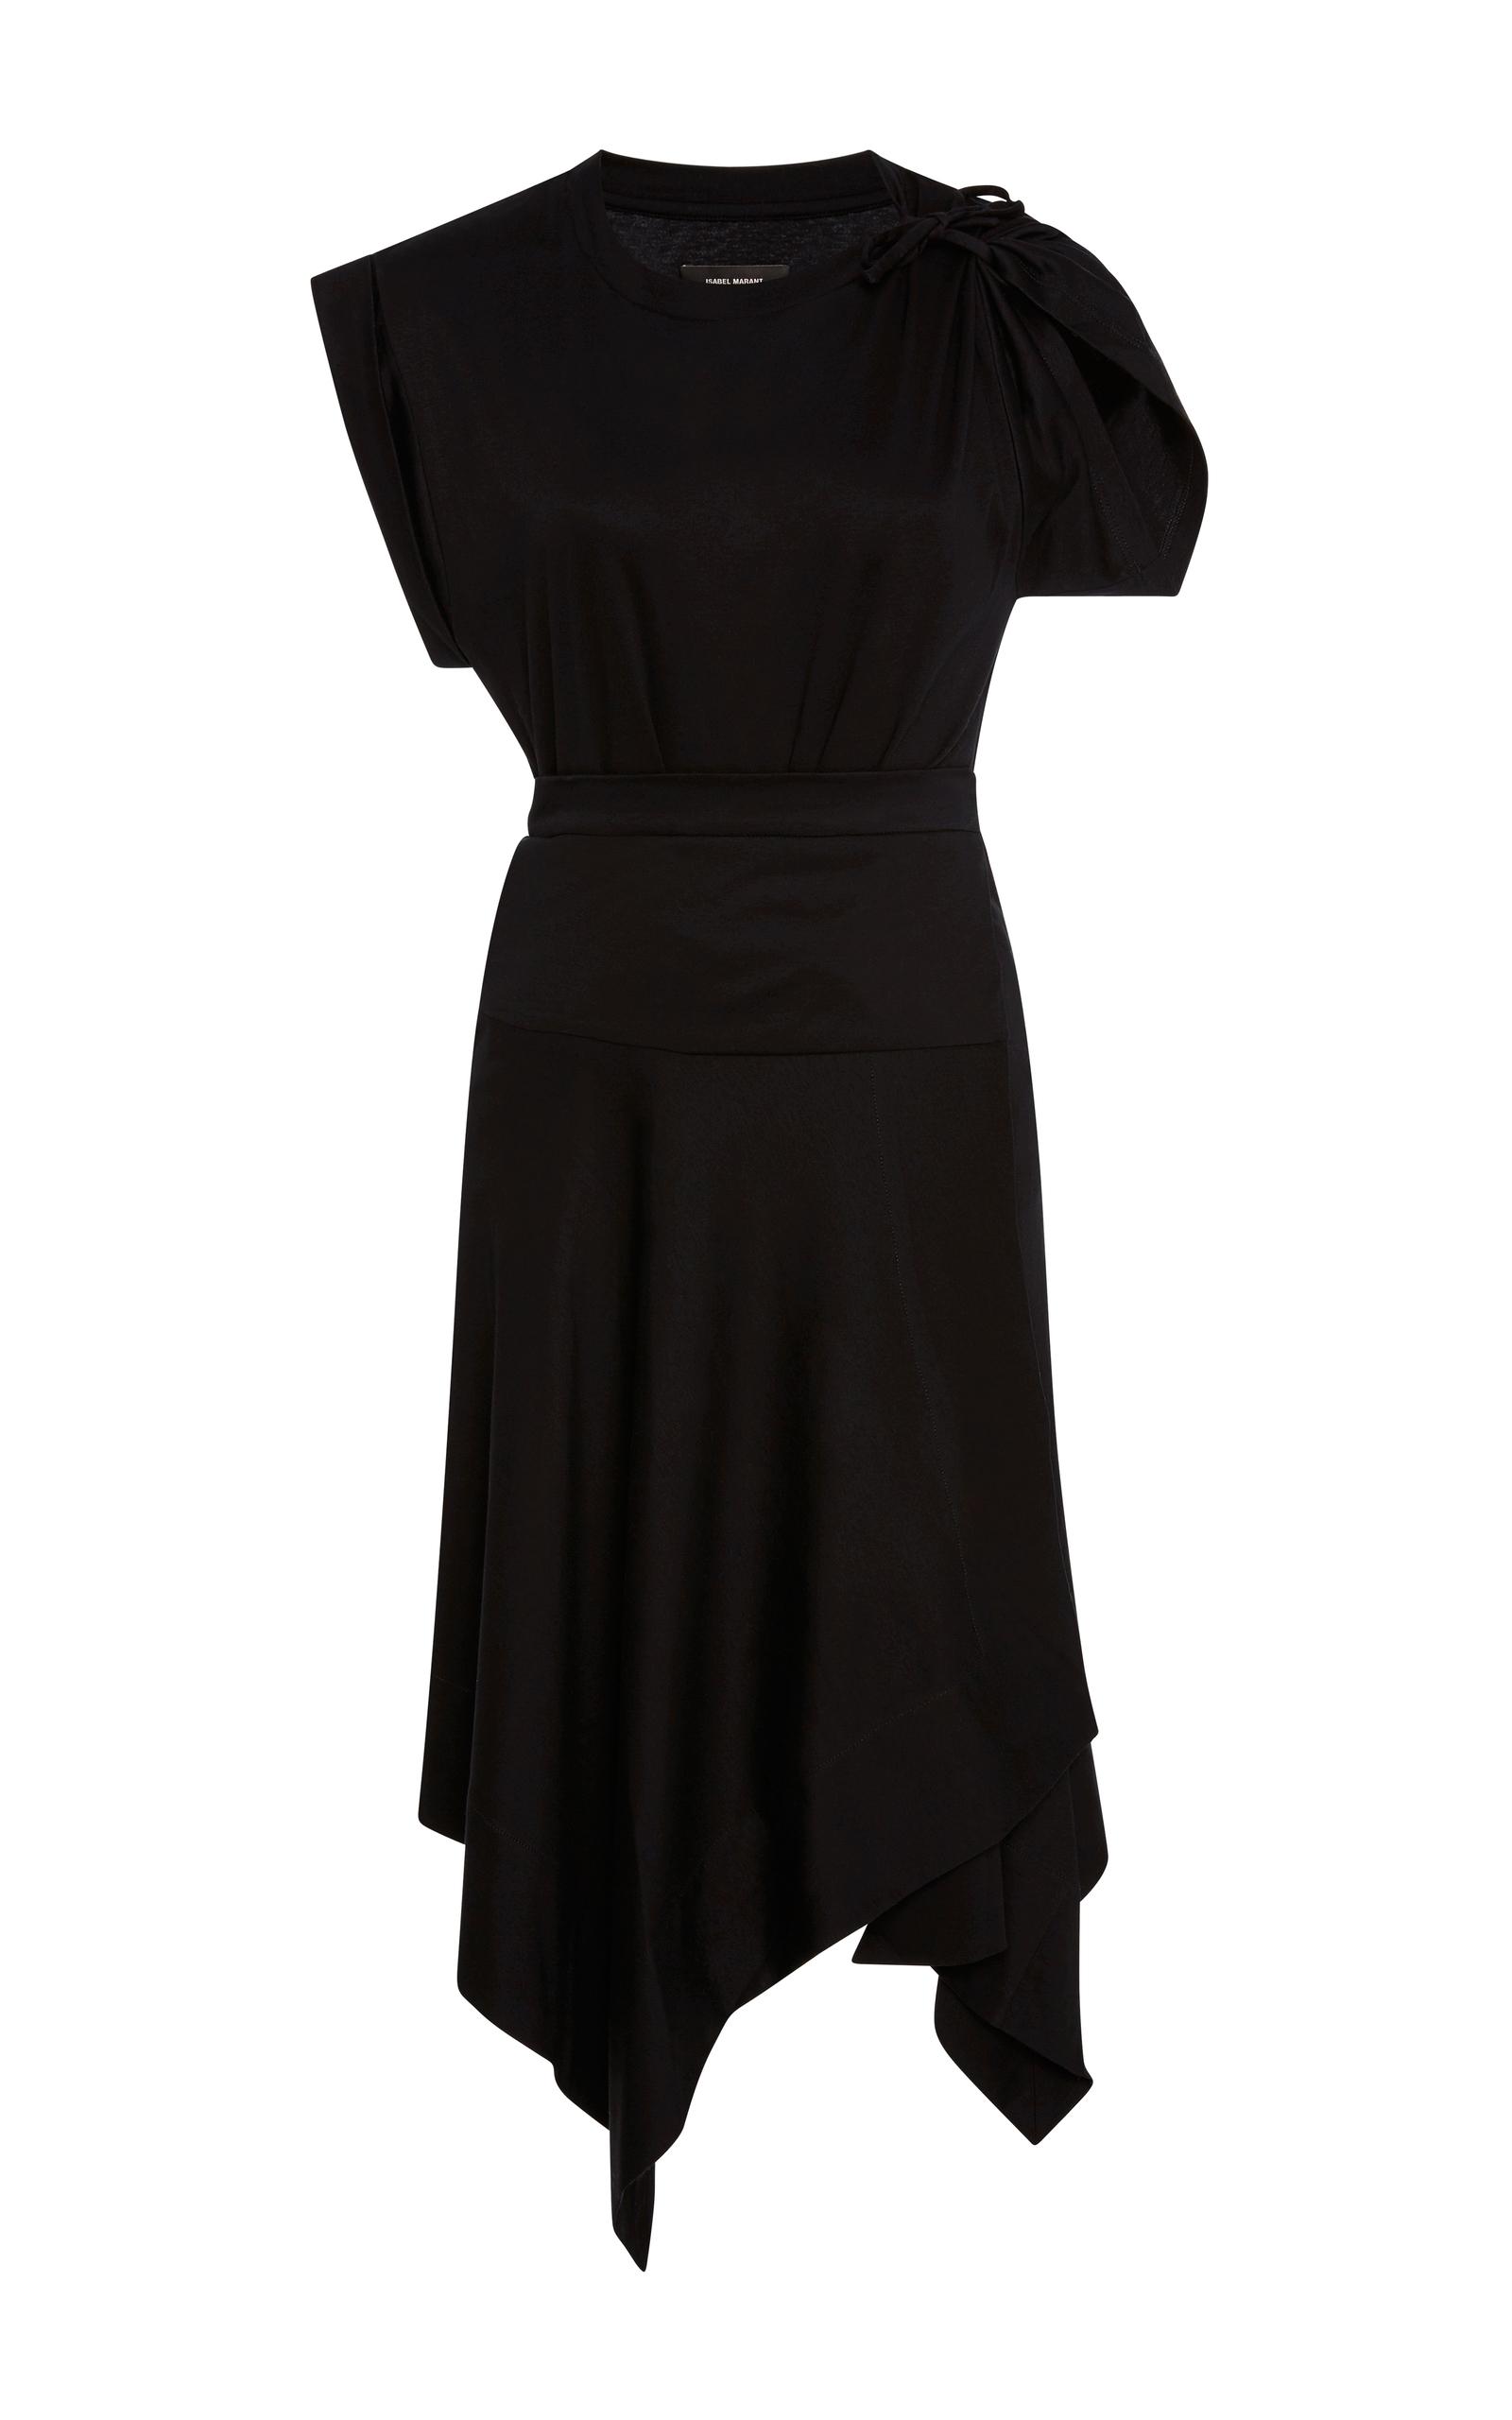 ISABEL MARANT Loko Cotton Jersey Wrap Dress in Black